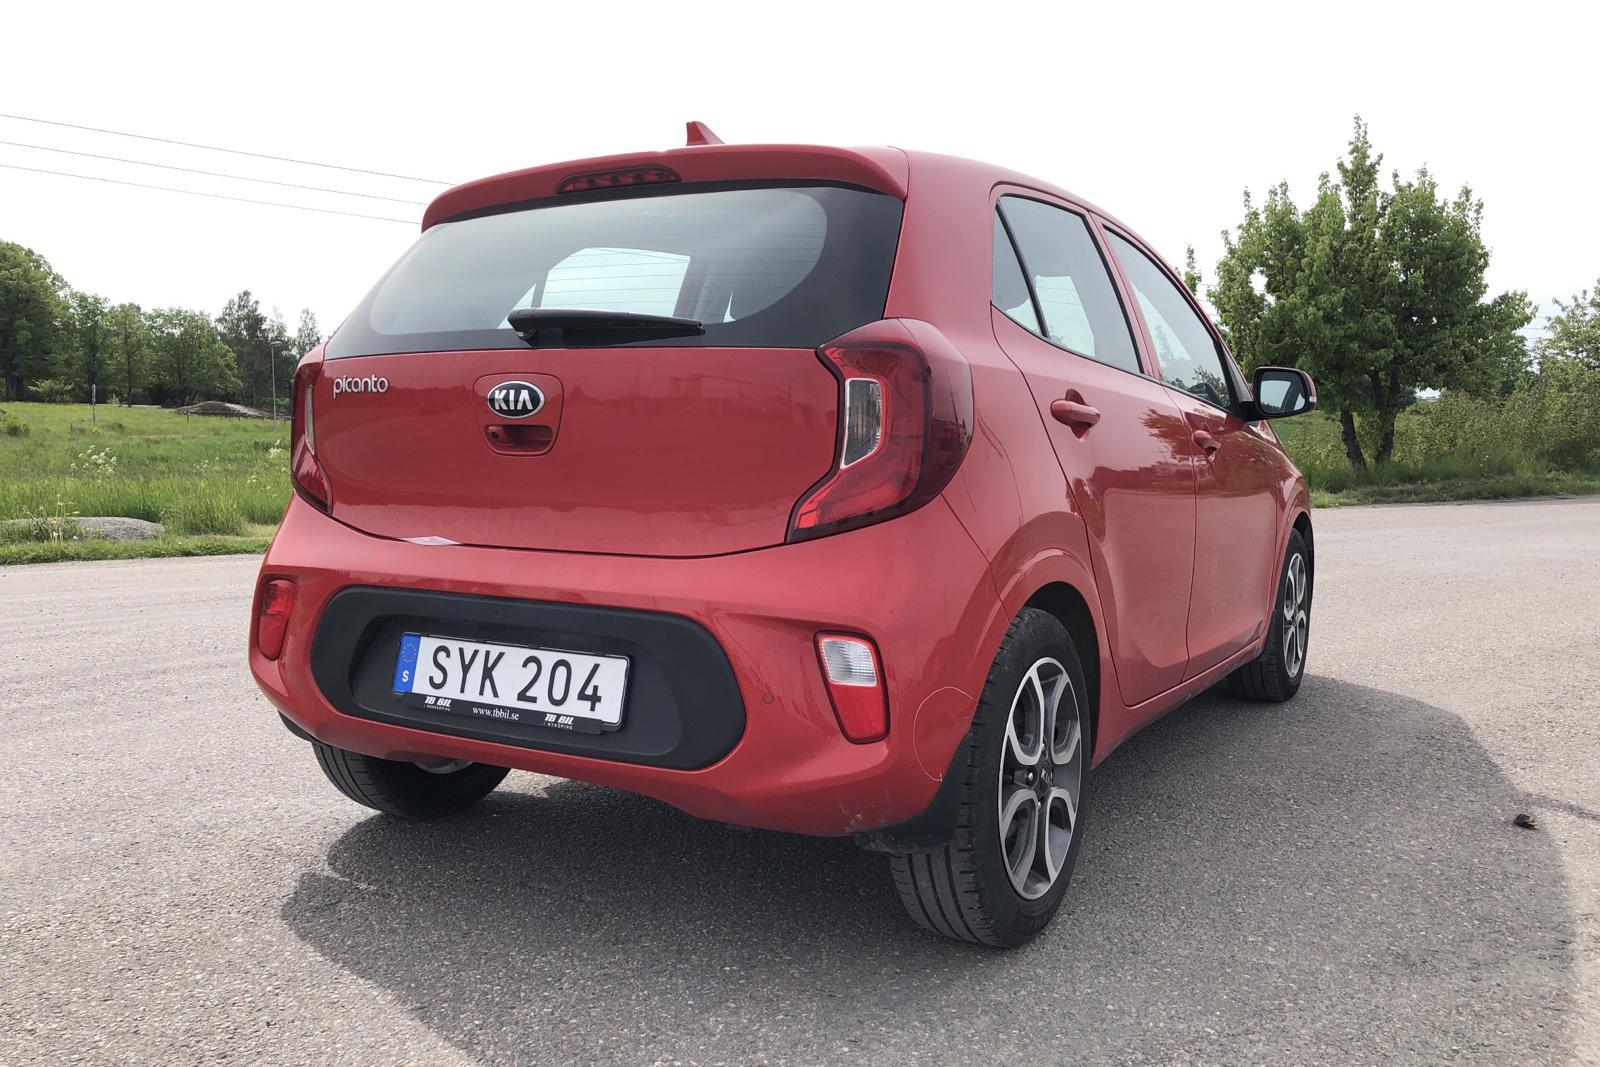 KIA Picanto 1.0 5dr (67hk) - 2 543 mil - Manuell - röd - 2019